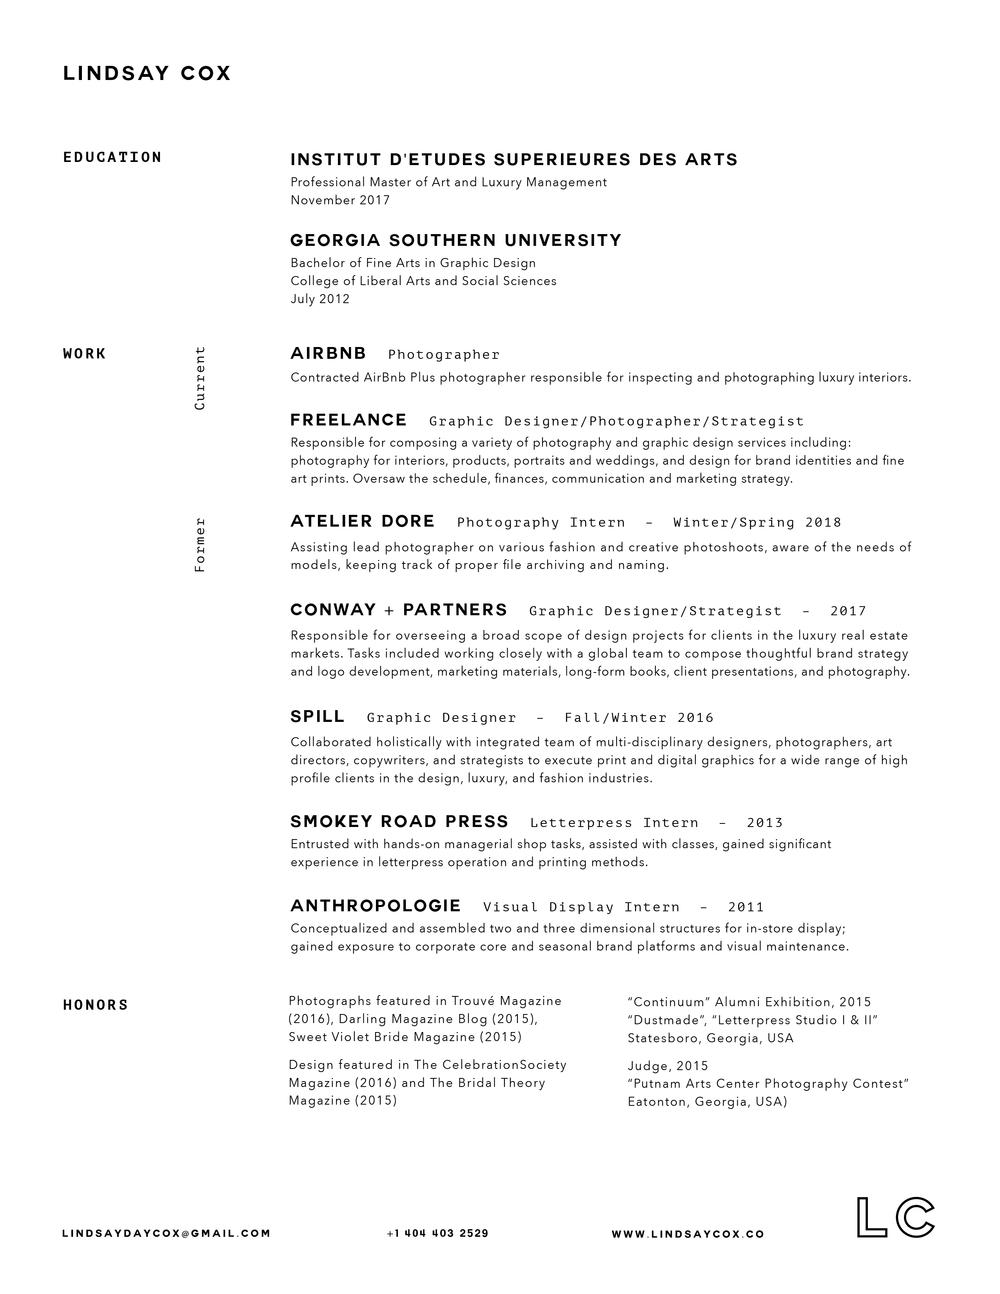 LINDSAYCOX_Resume.png